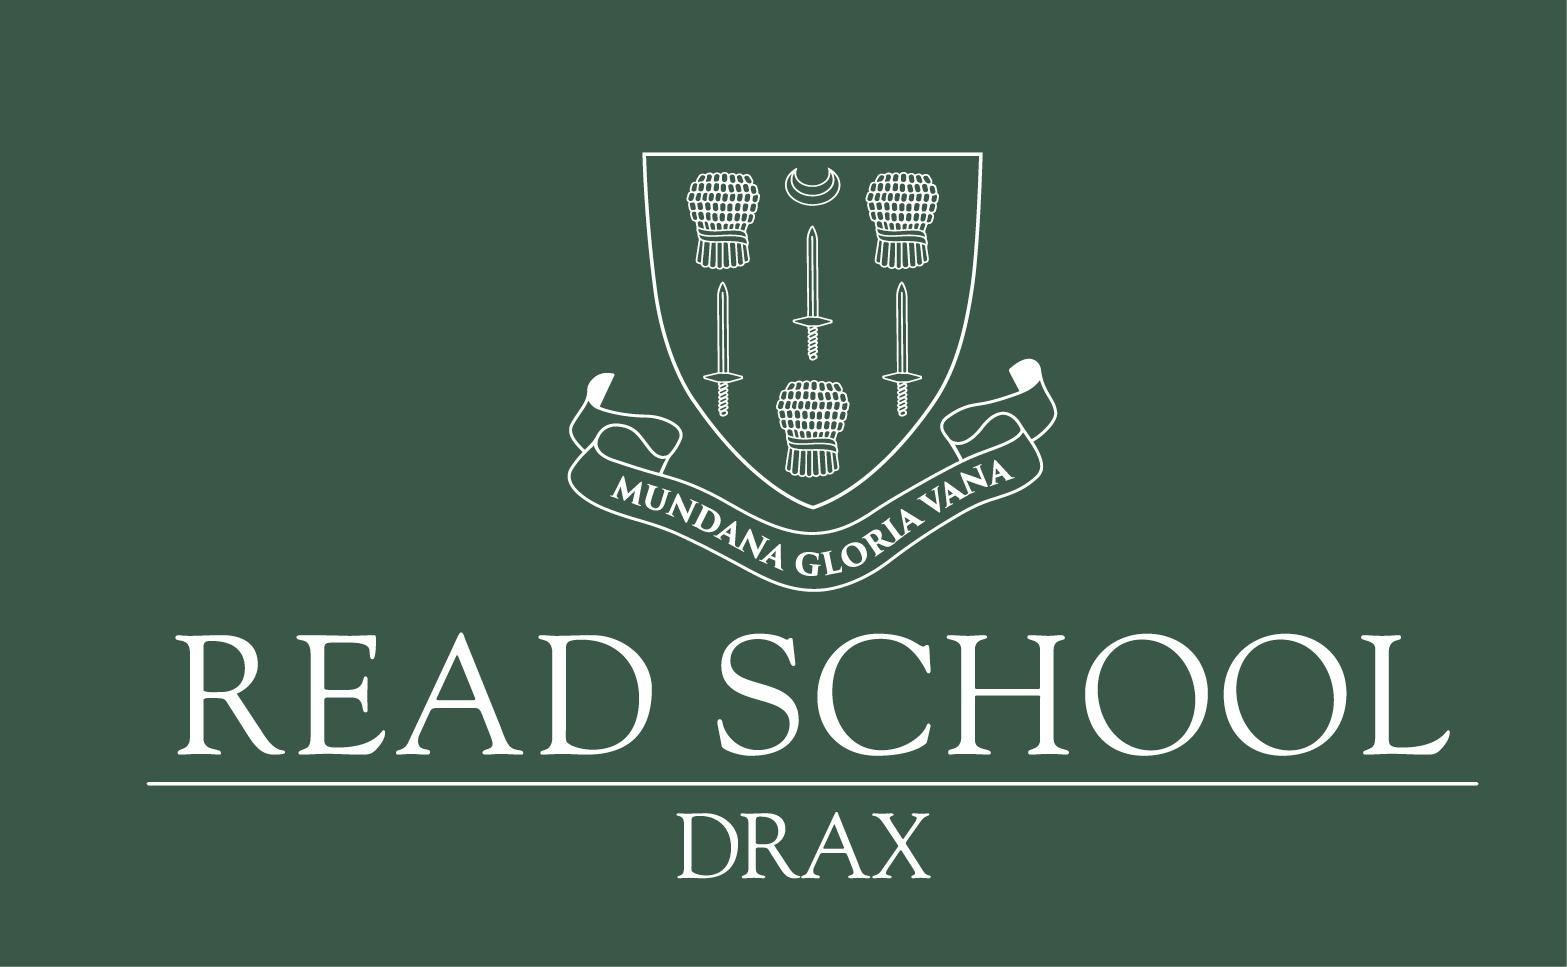 The Read School